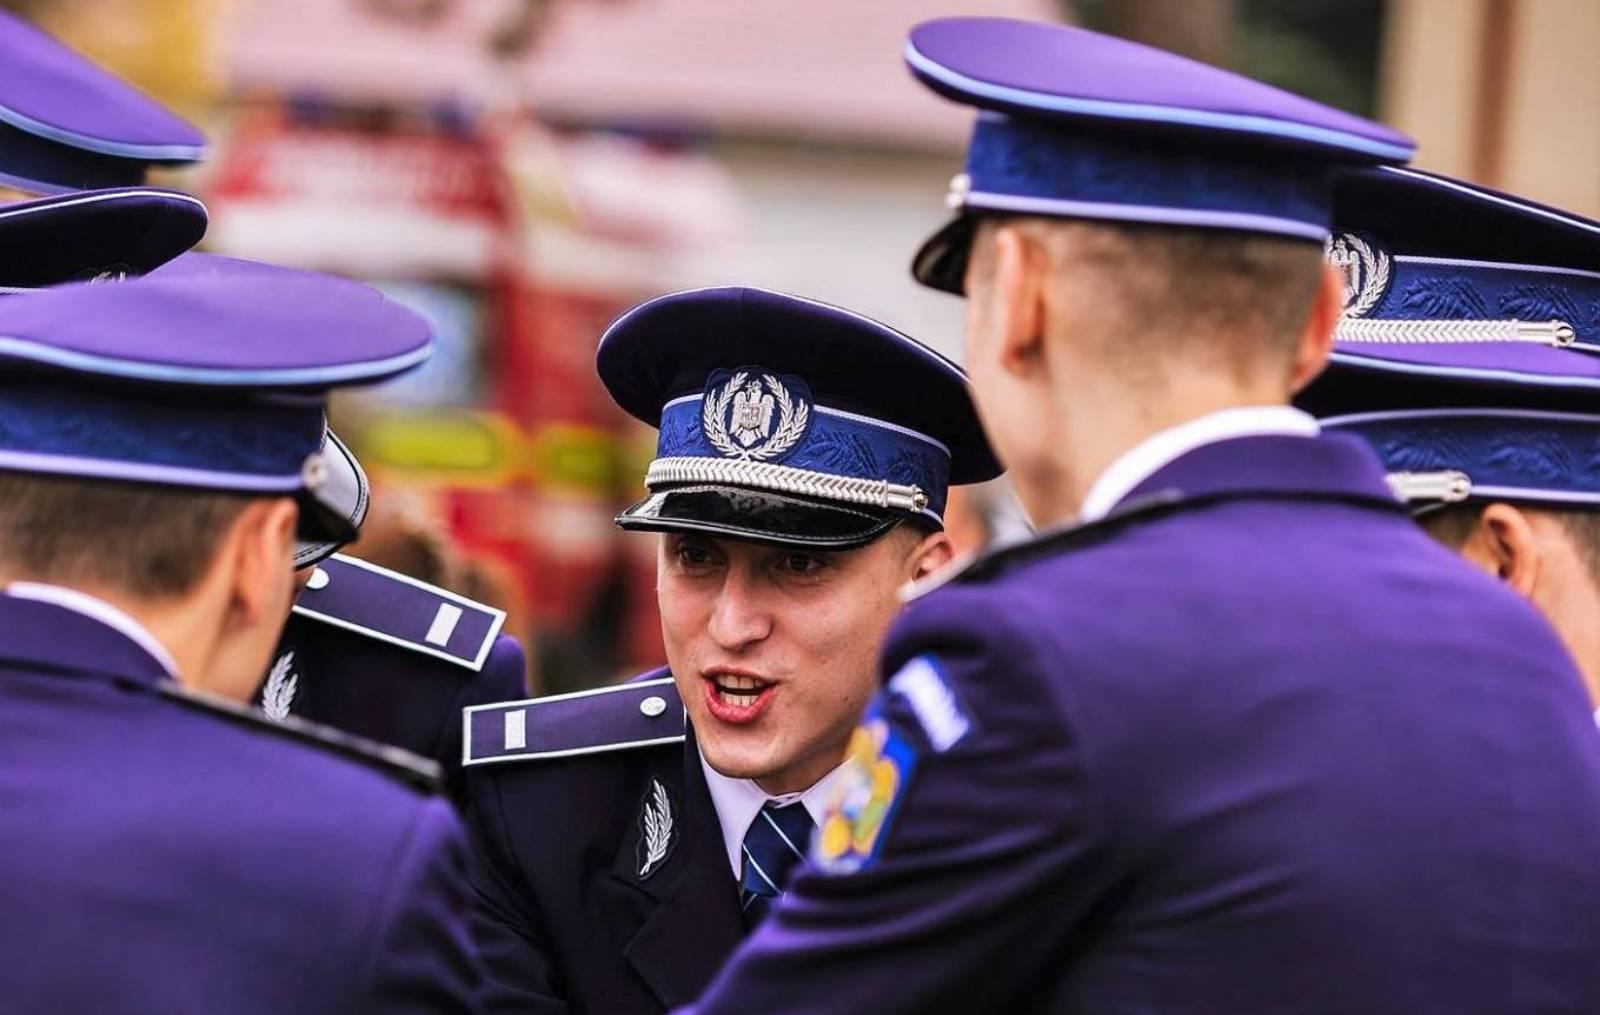 Politia Romana baut apa